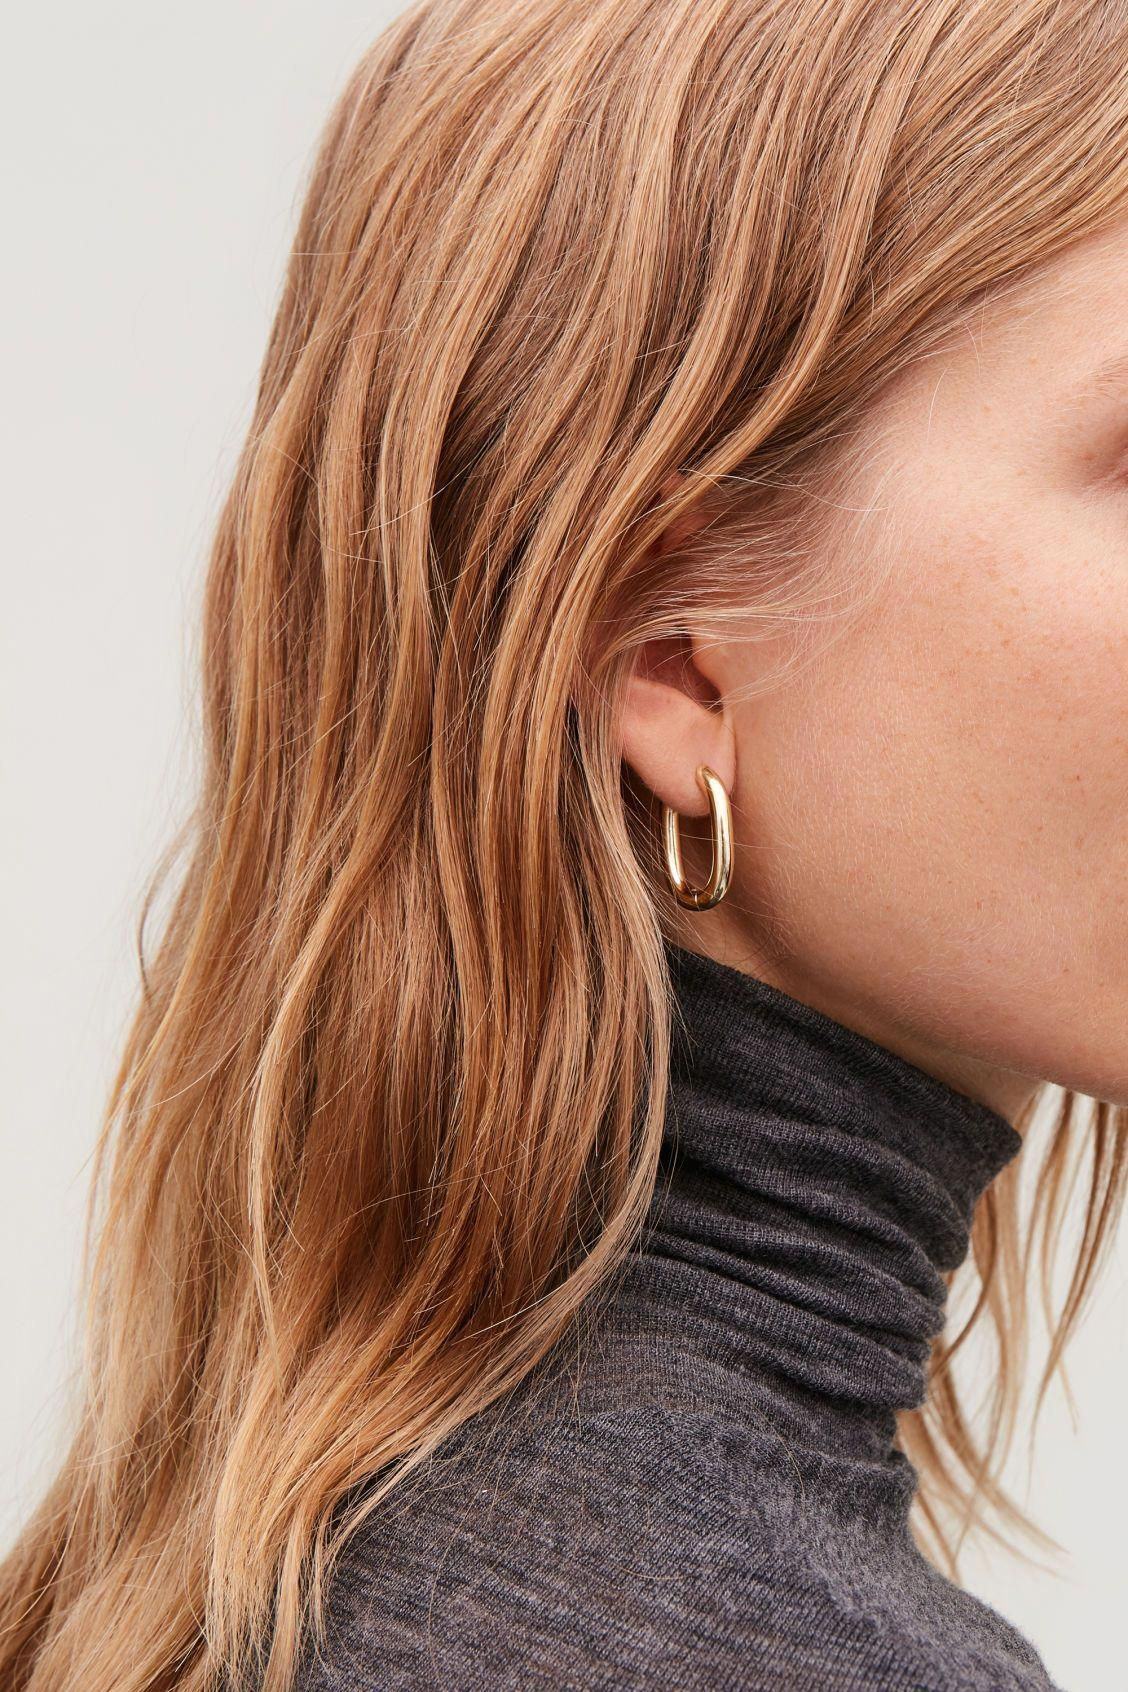 Mini Bar Stud earrings in 14K Gold fill, short gold bar stud, gold fill bar post earrings, gold bar earring, minimalist jewelry